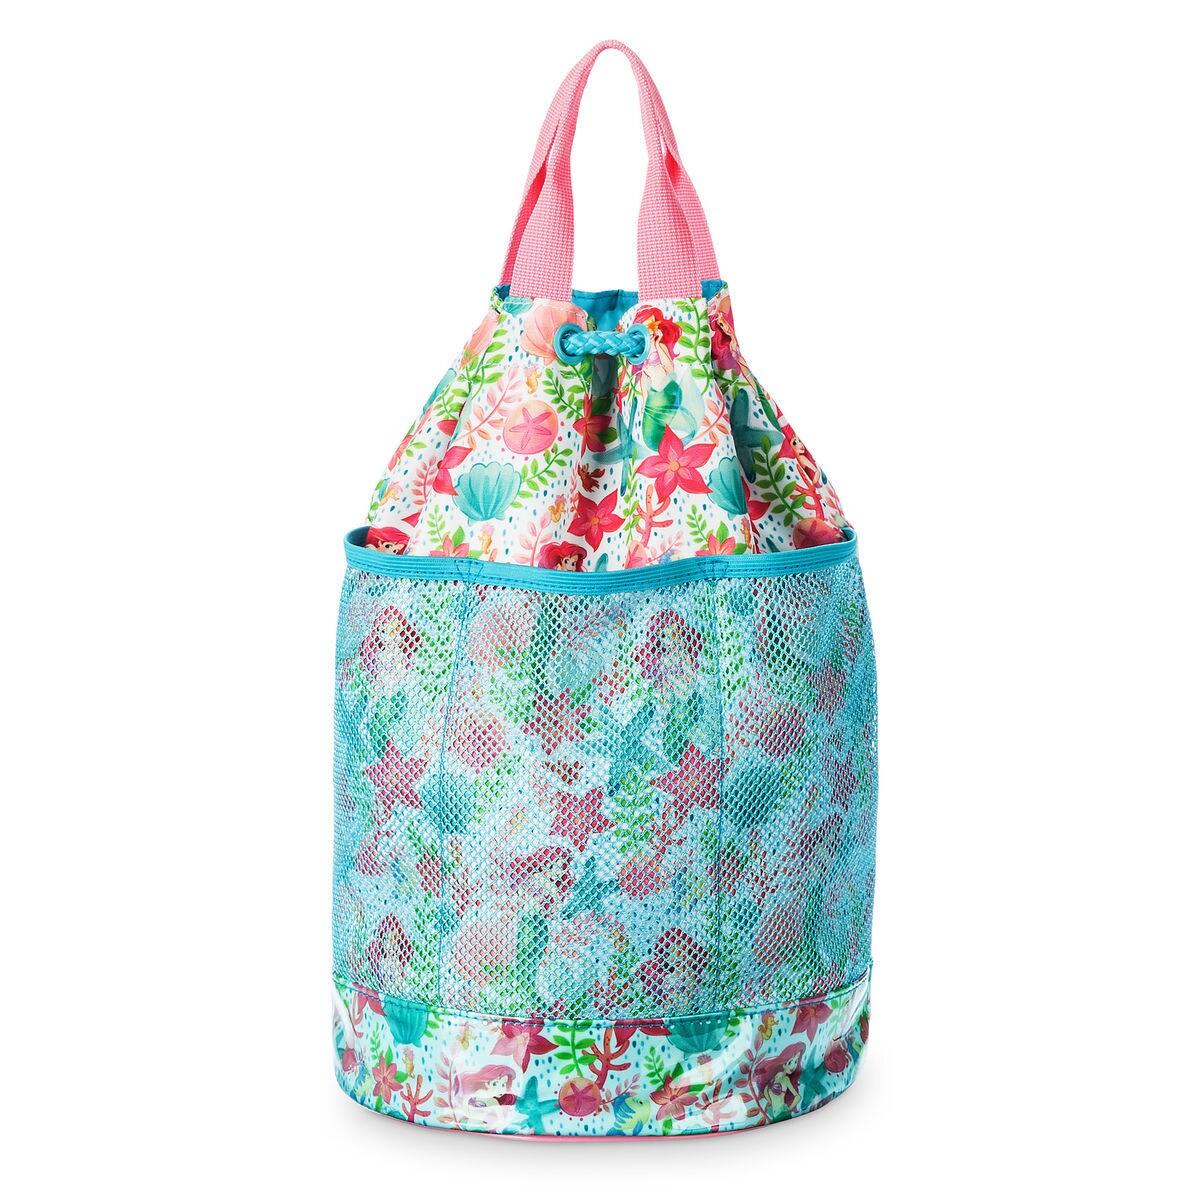 Product Image Of Ariel Swim Bag For Kids 1